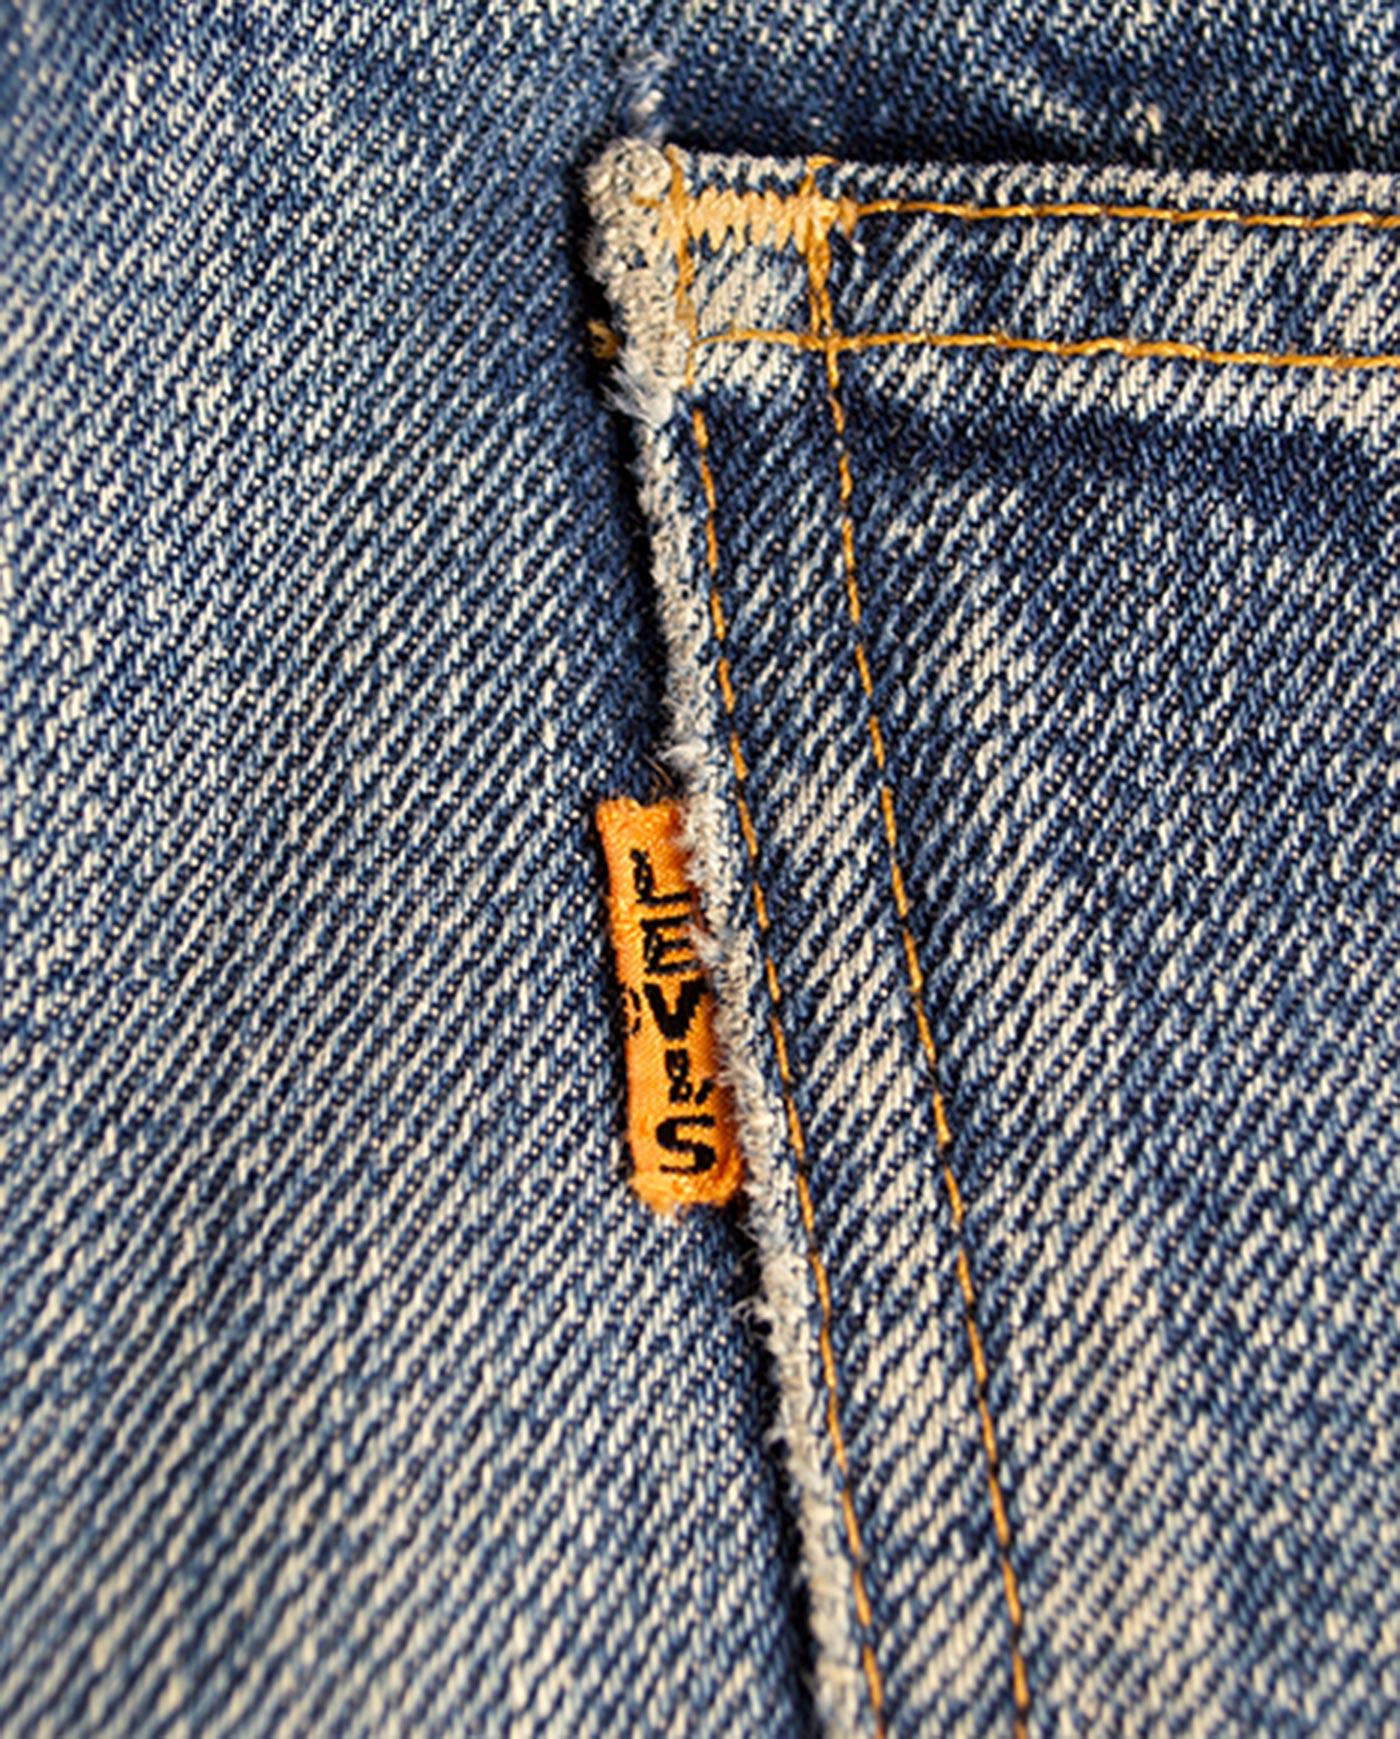 LEVIS Big E denim pant double stitching 50s - Madeinused